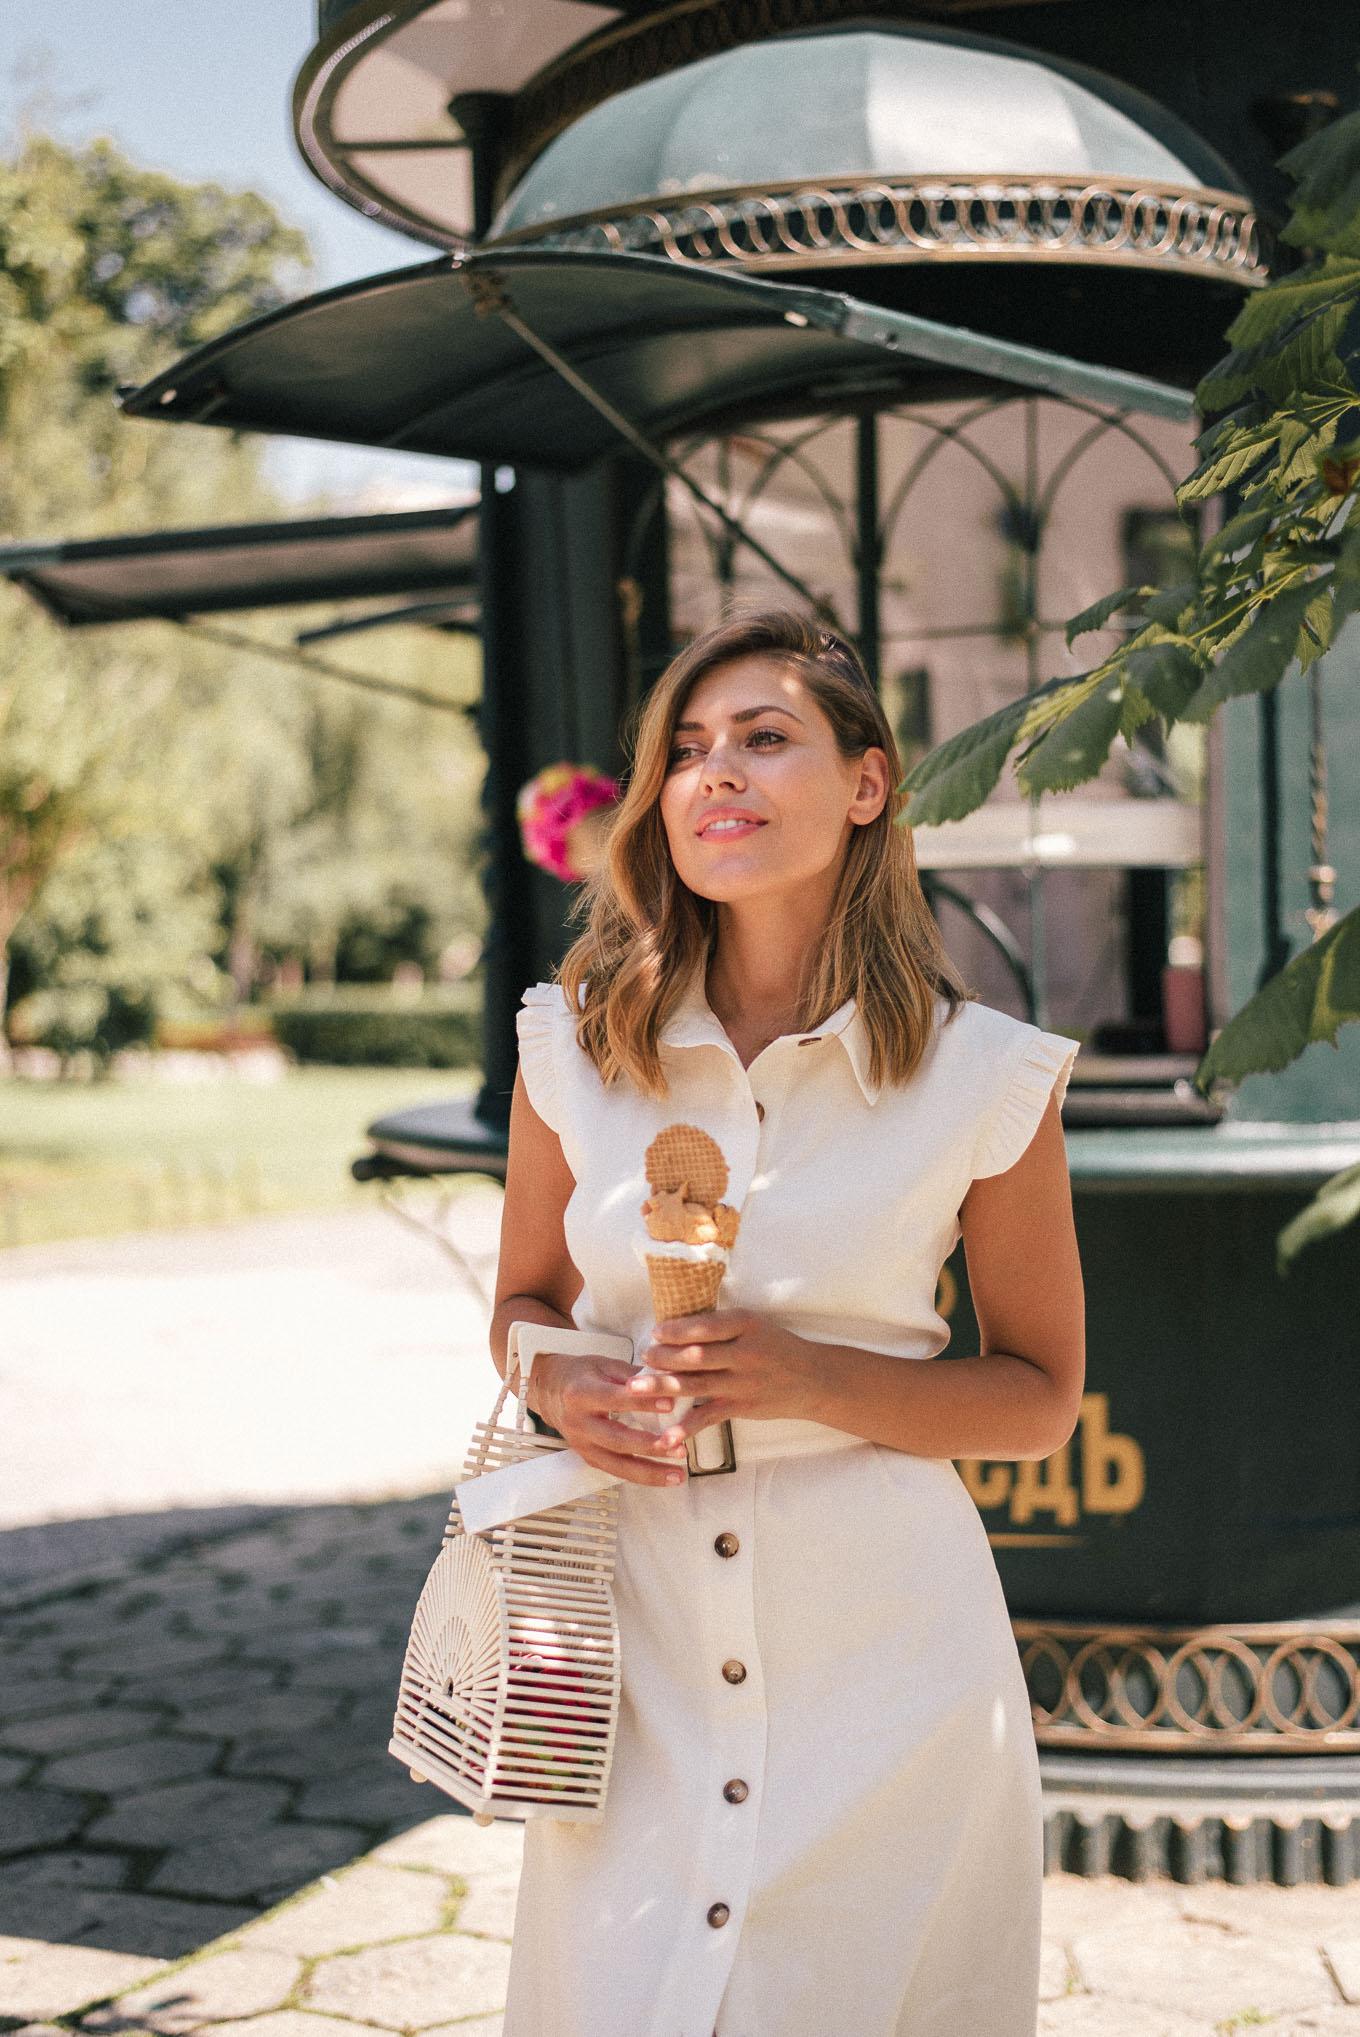 Best ice cream in Sofia